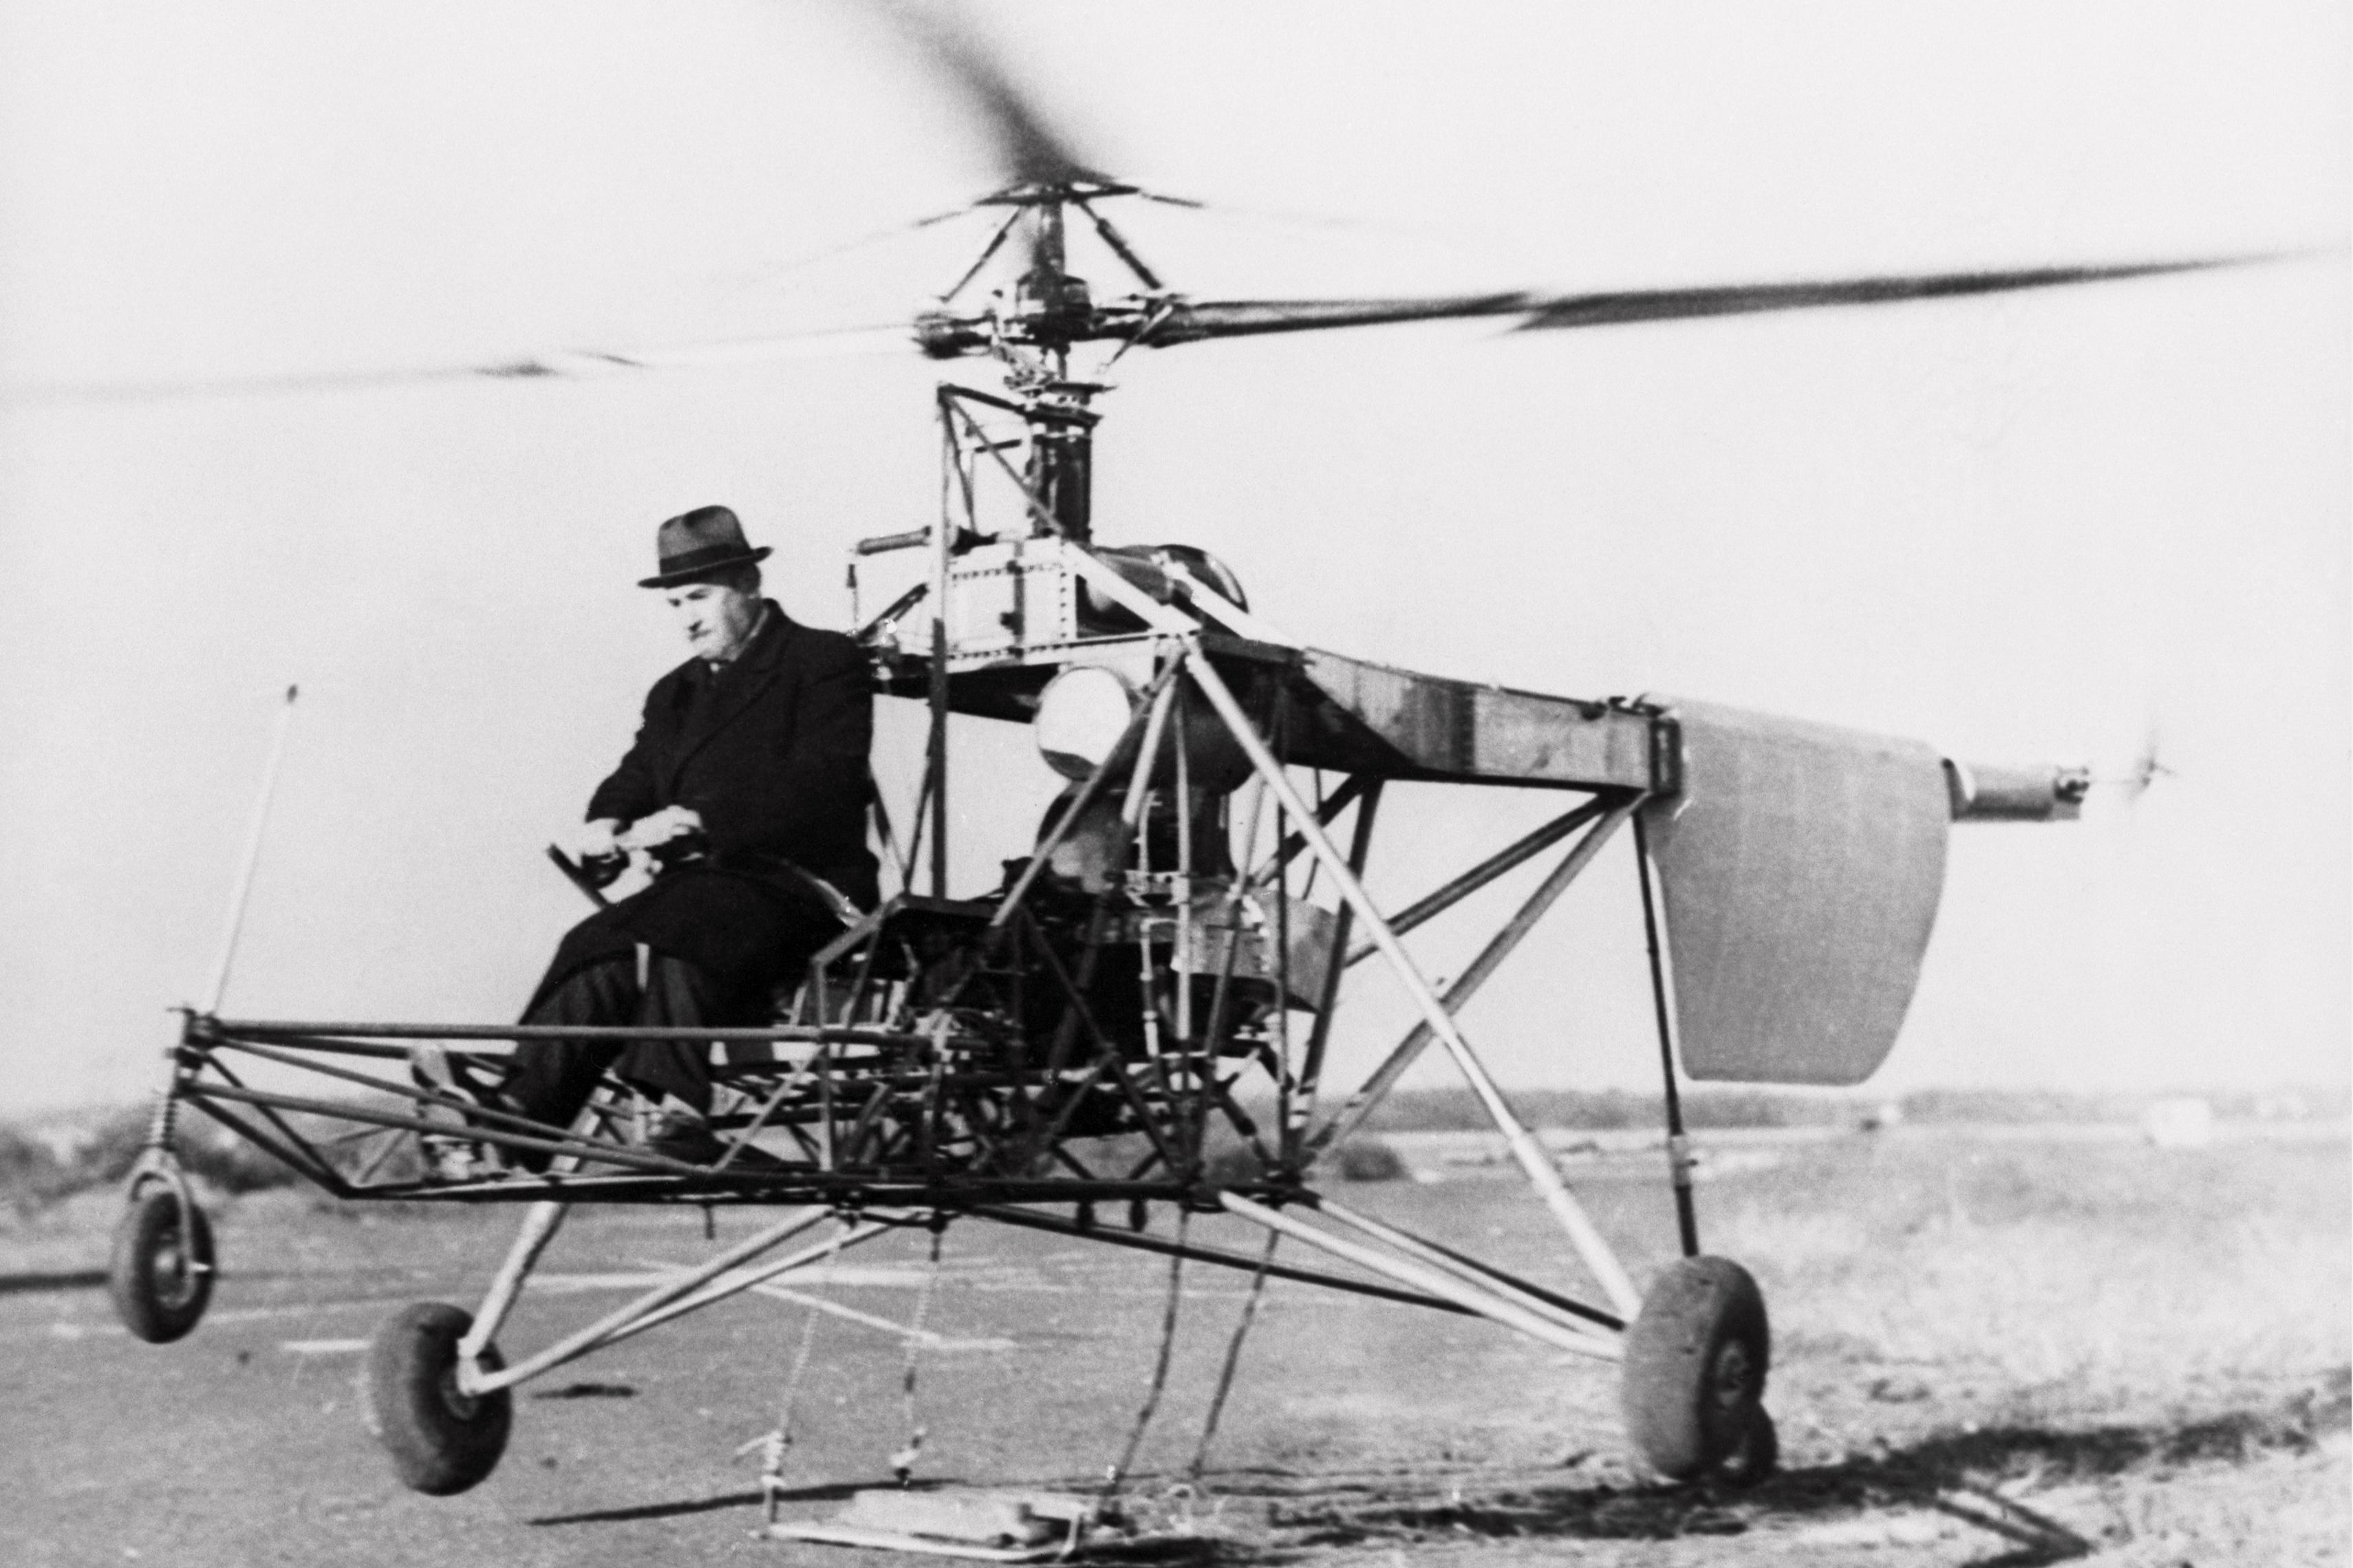 вертолет сикорского приколы картинки архитектурные